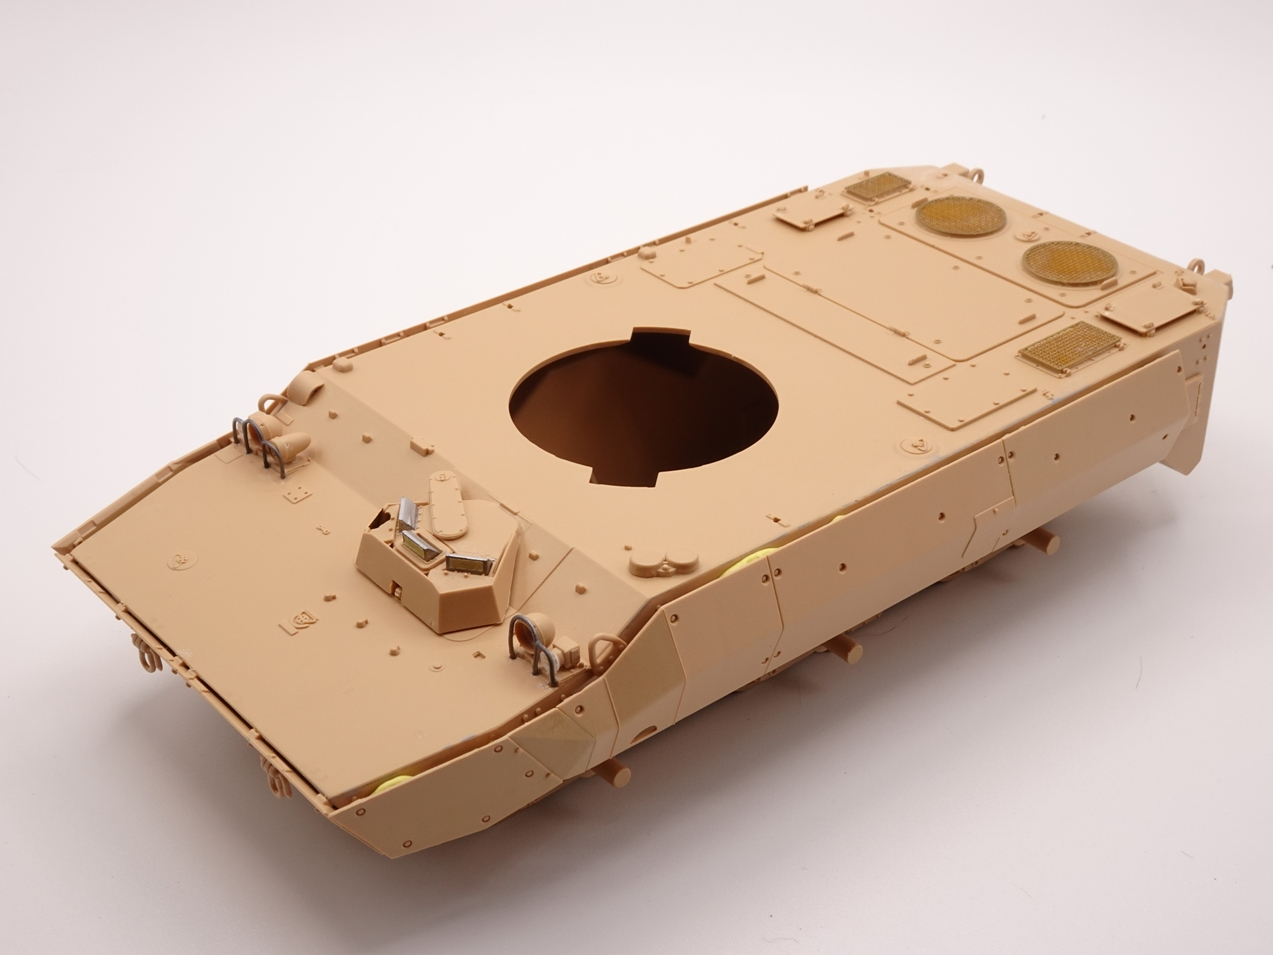 [Tiger Model] AMX-10RCR réf. 4602 - 1/35 - Page 2 Amx10-1907-1